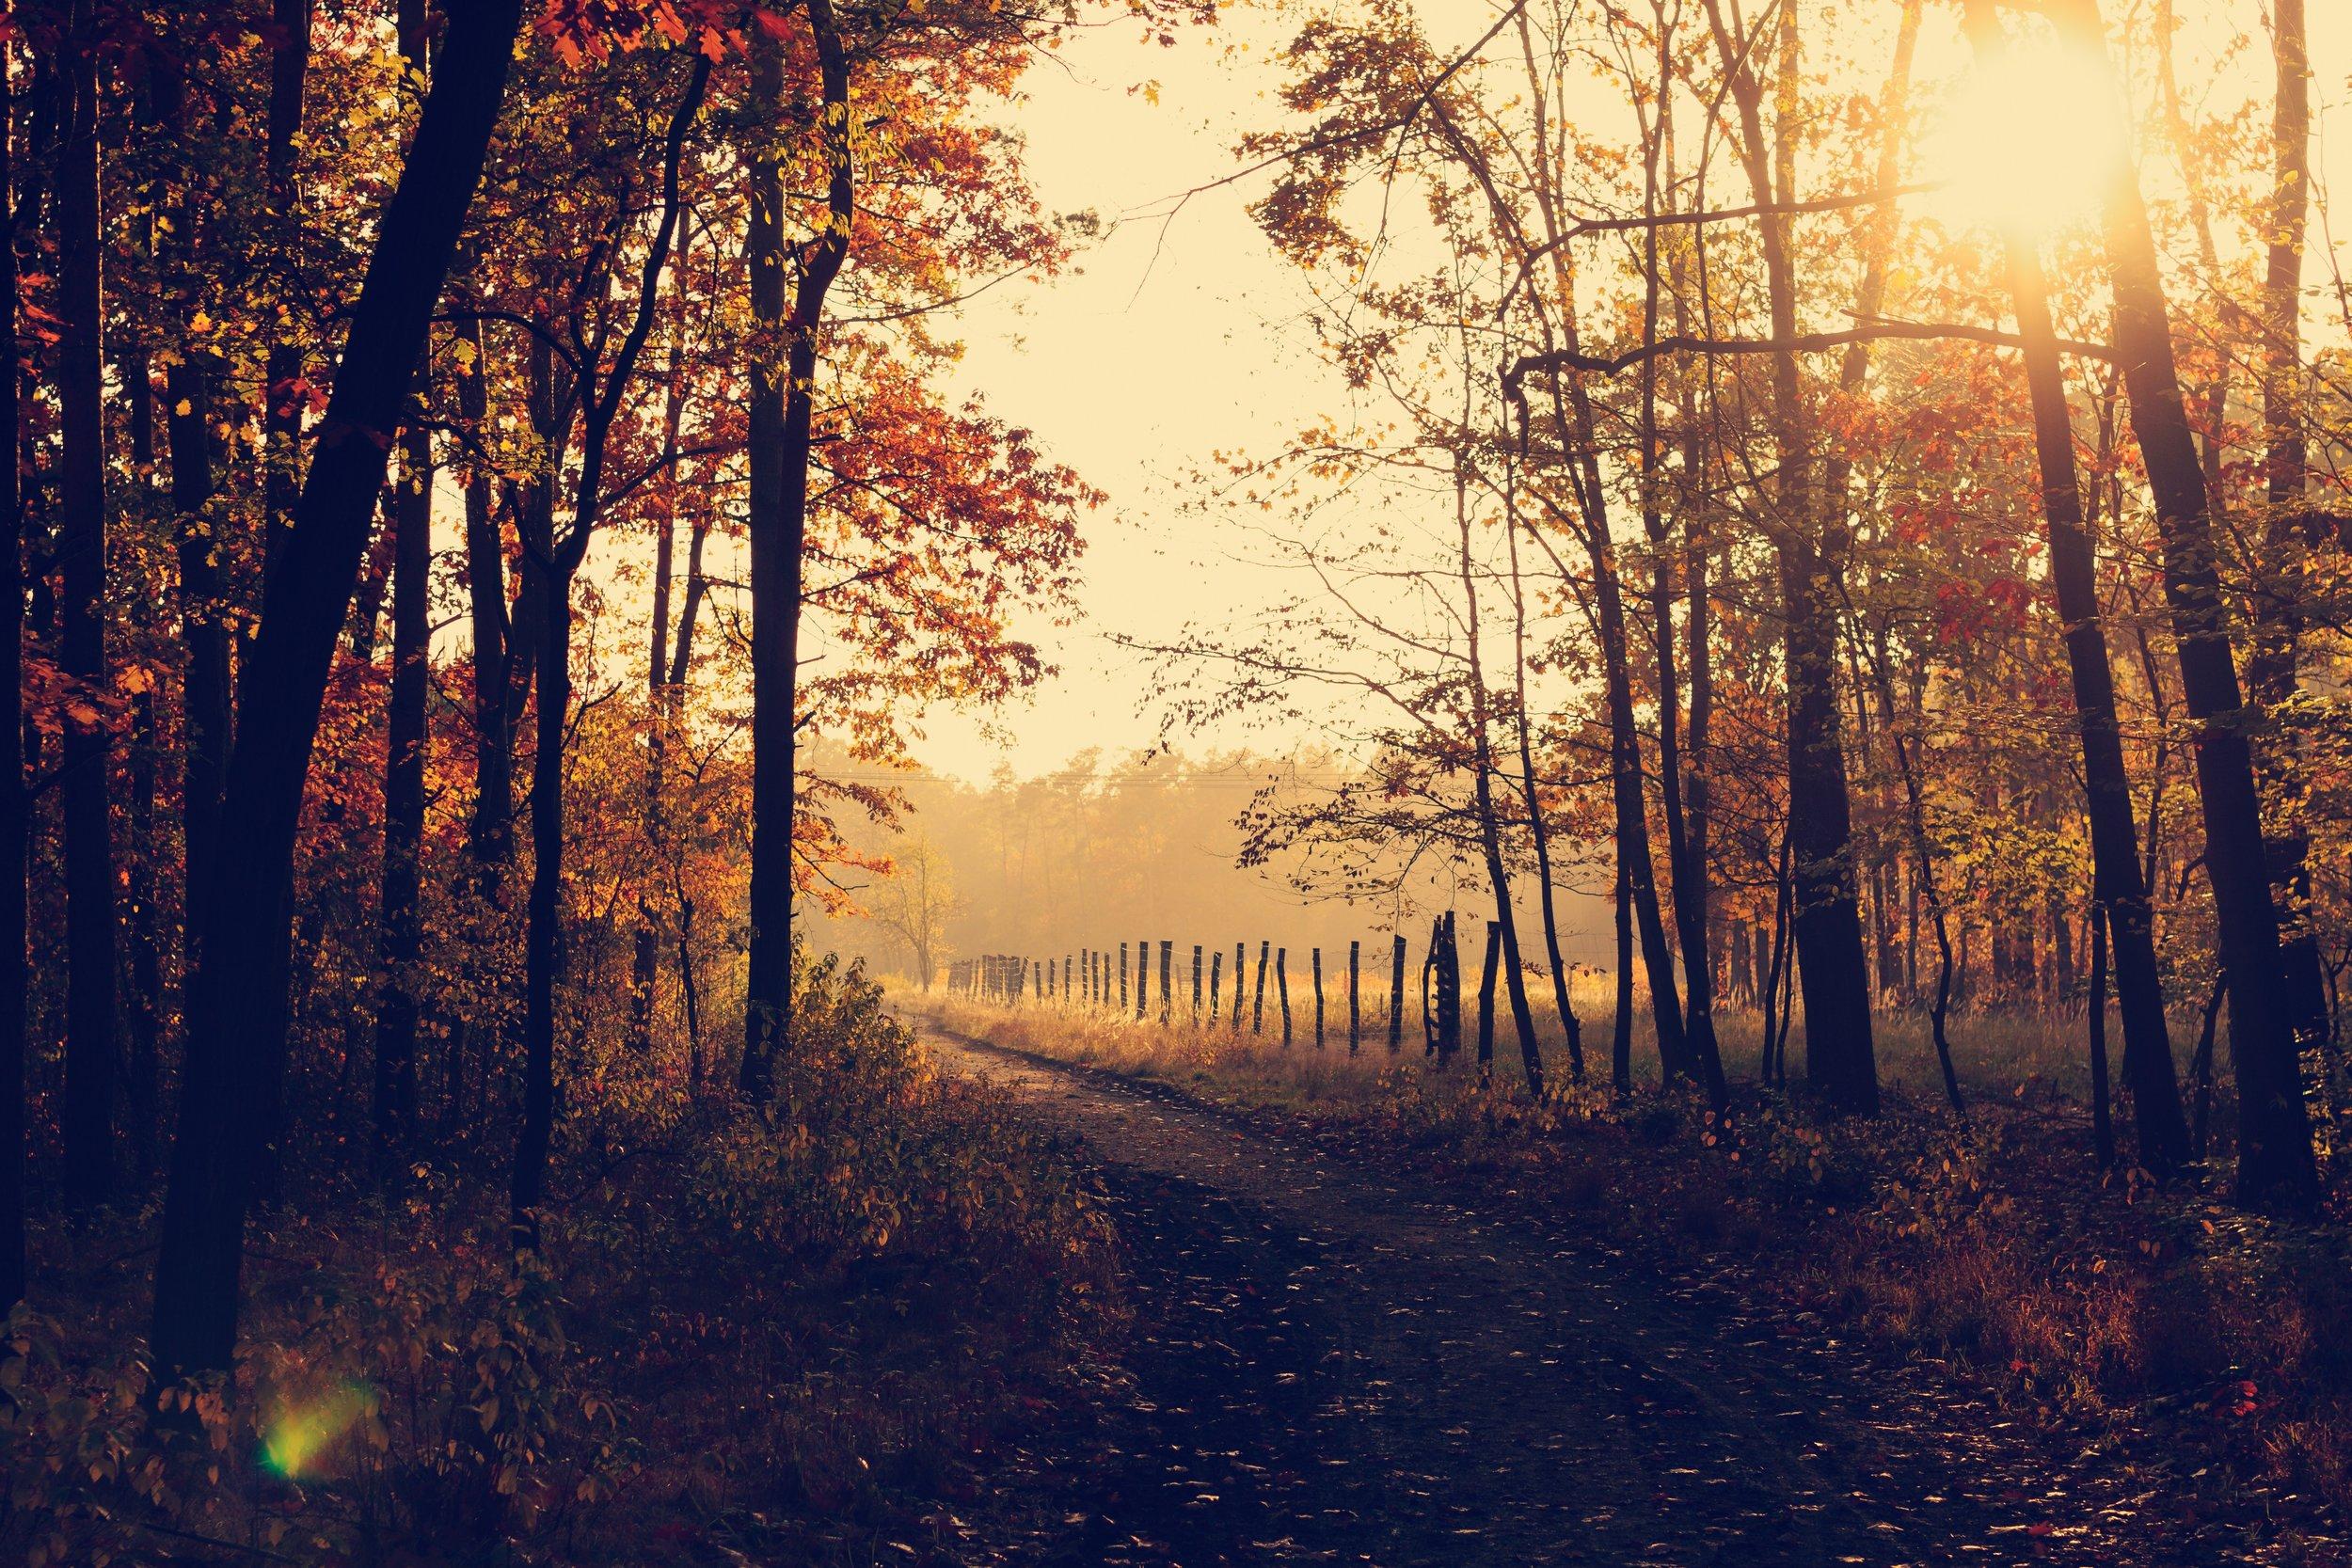 lukasz-szmigiel-41435-unsplash path fall meadow.jpg